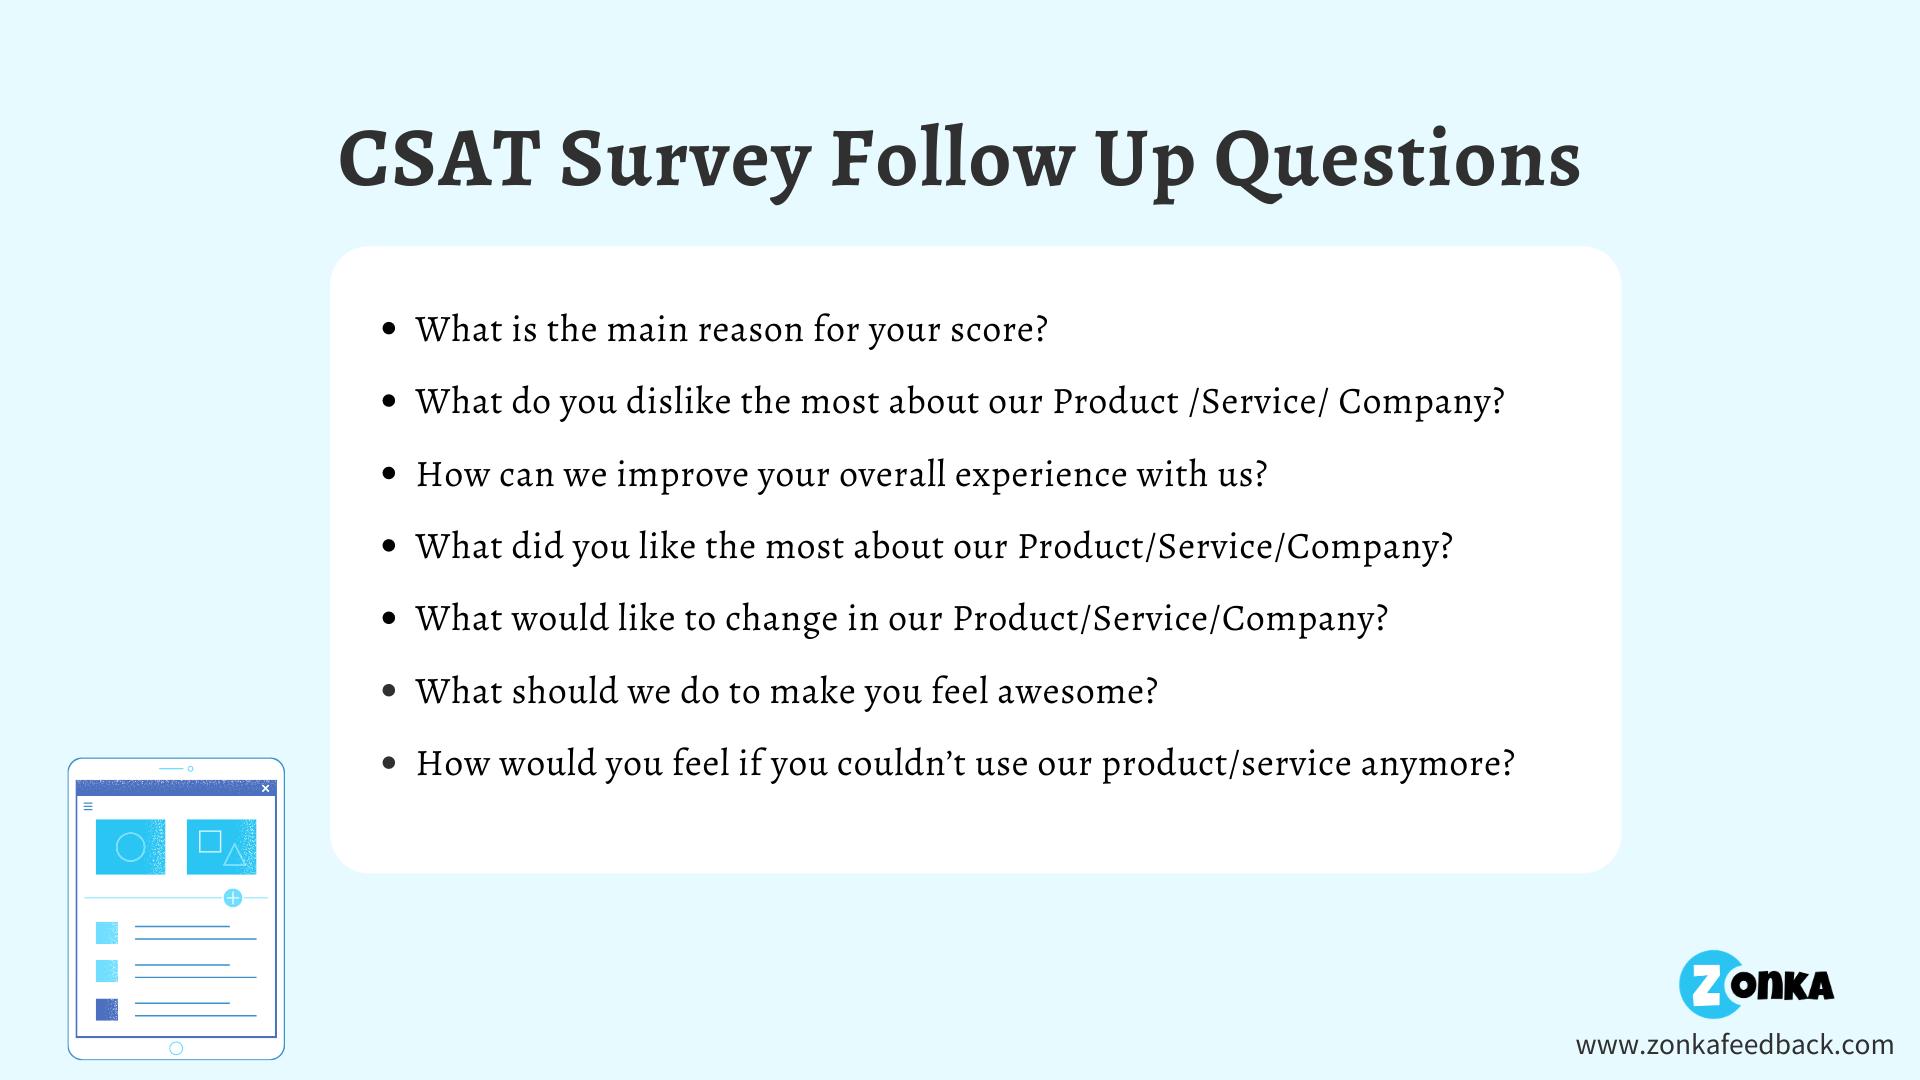 CSAT Survey Follow-Up Questions